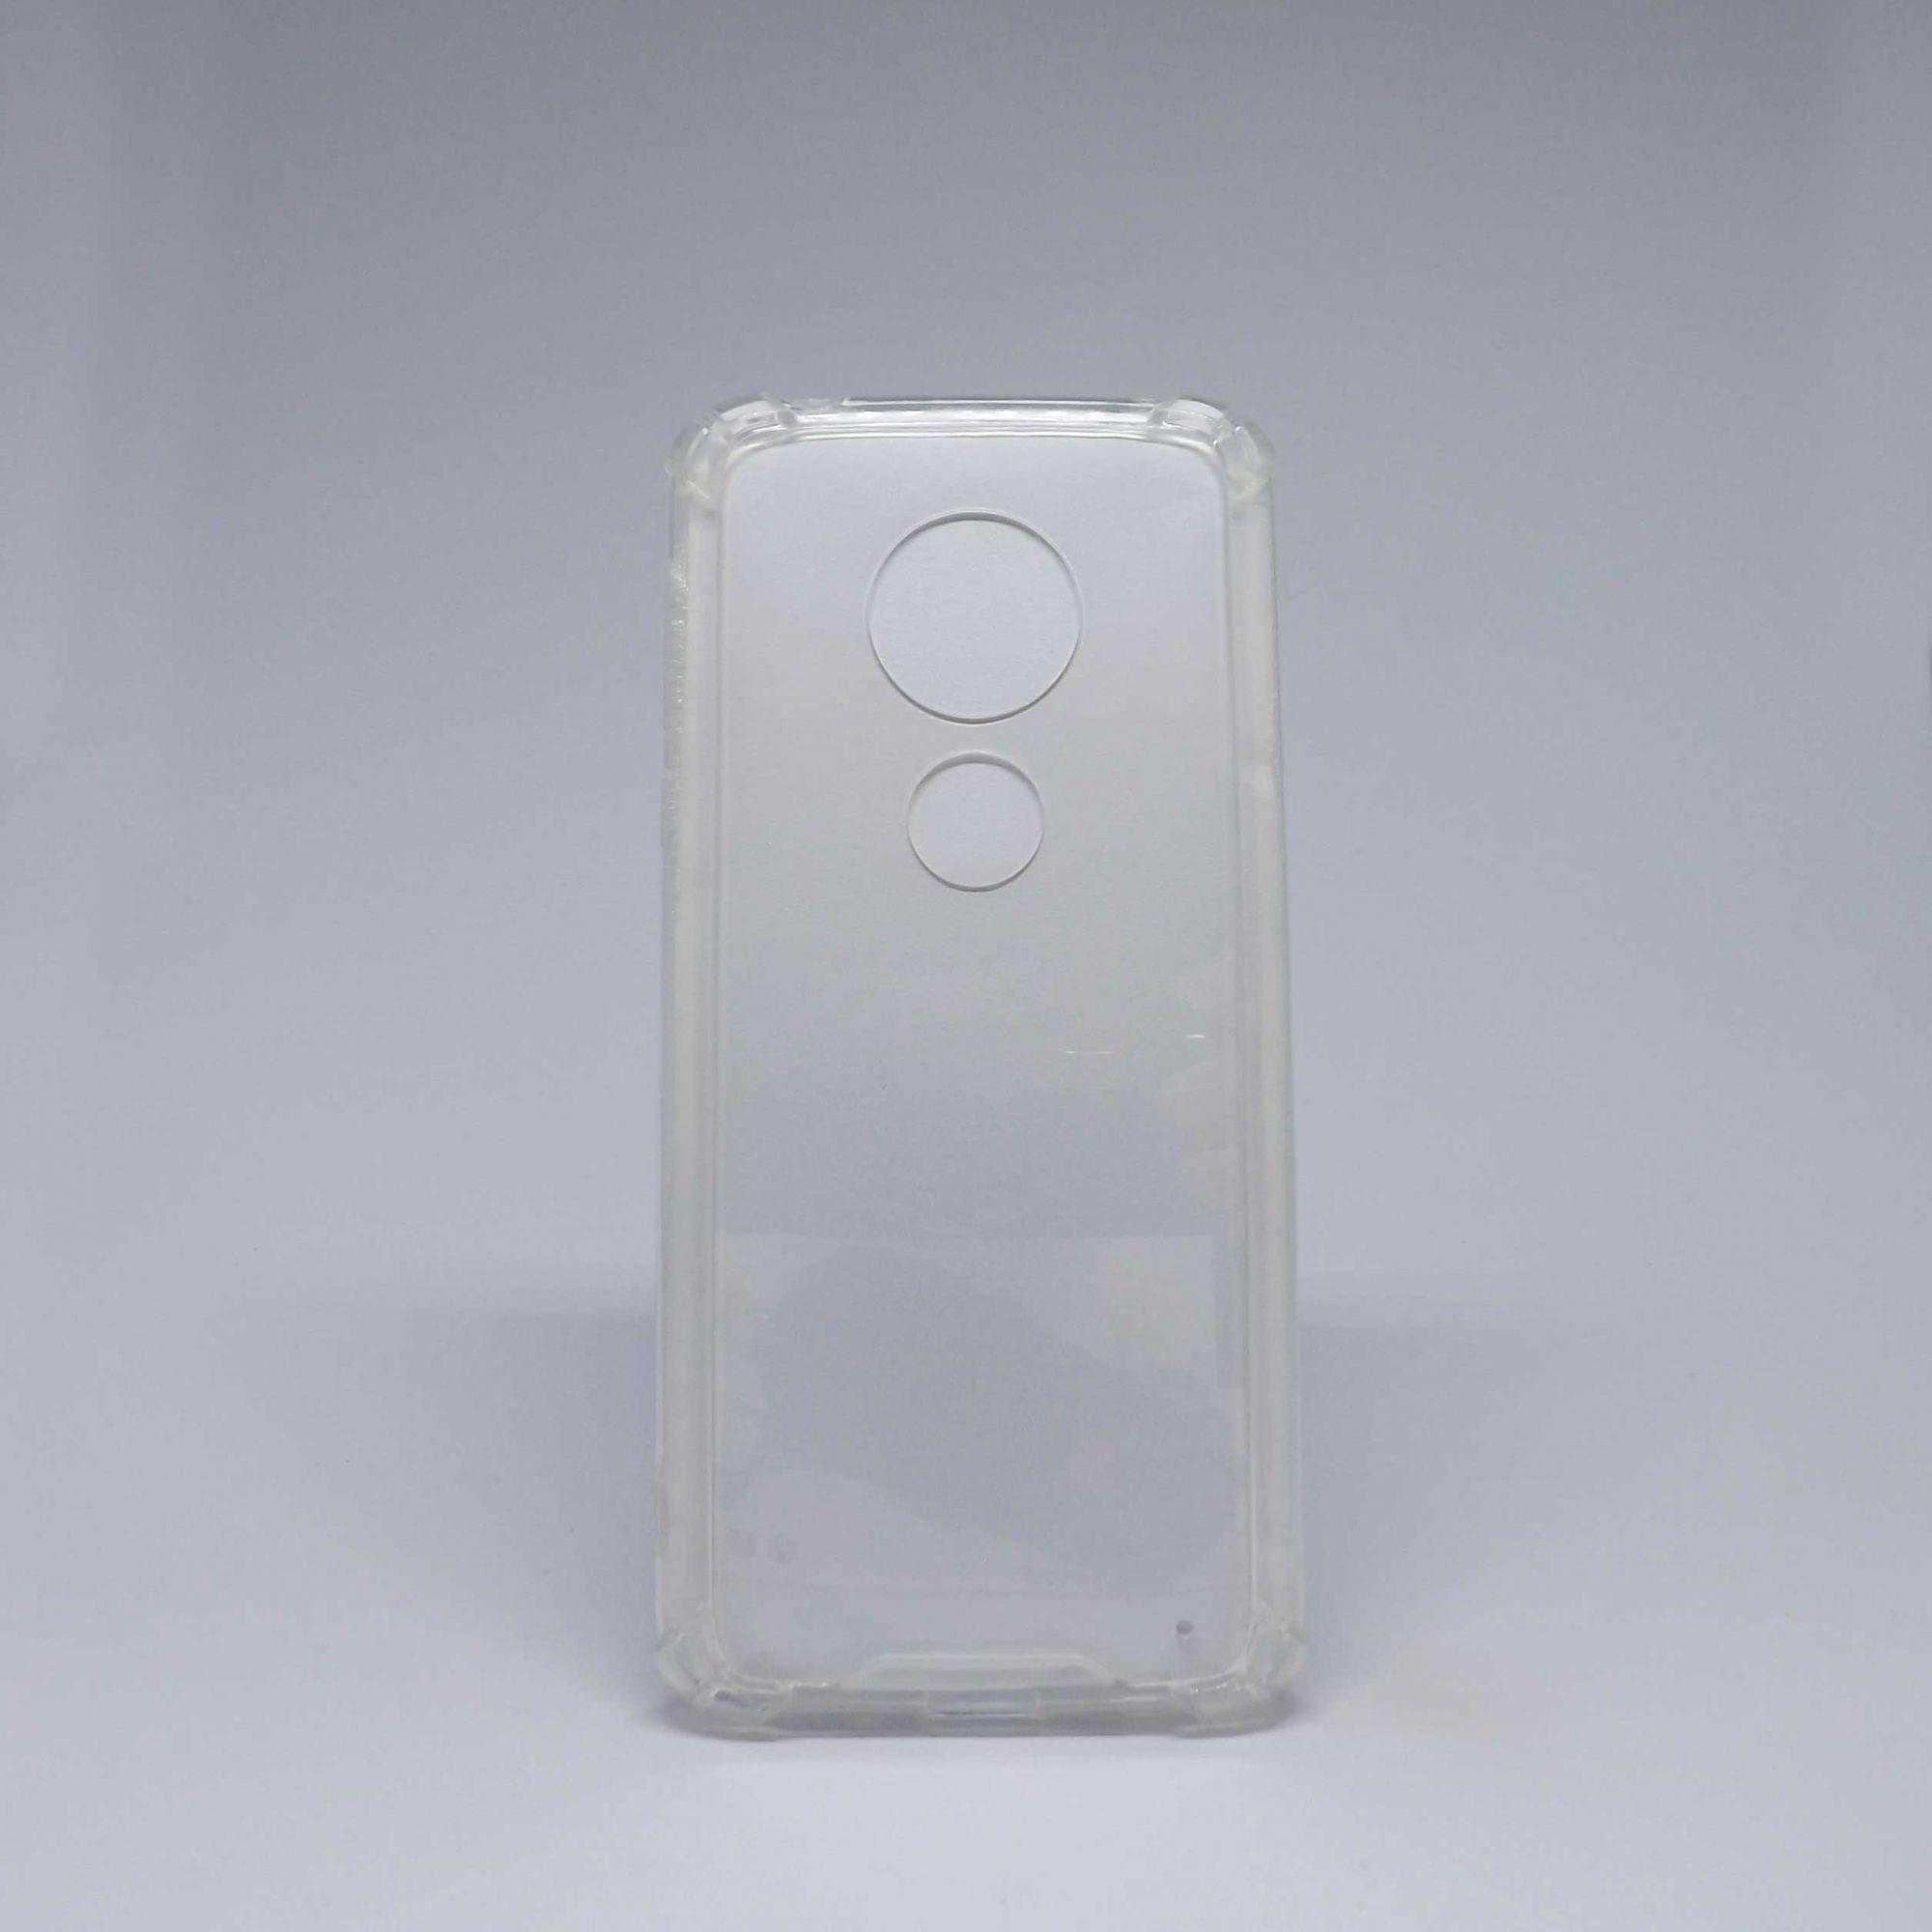 Capa Motorola G6 Play Antiqueda Transparente